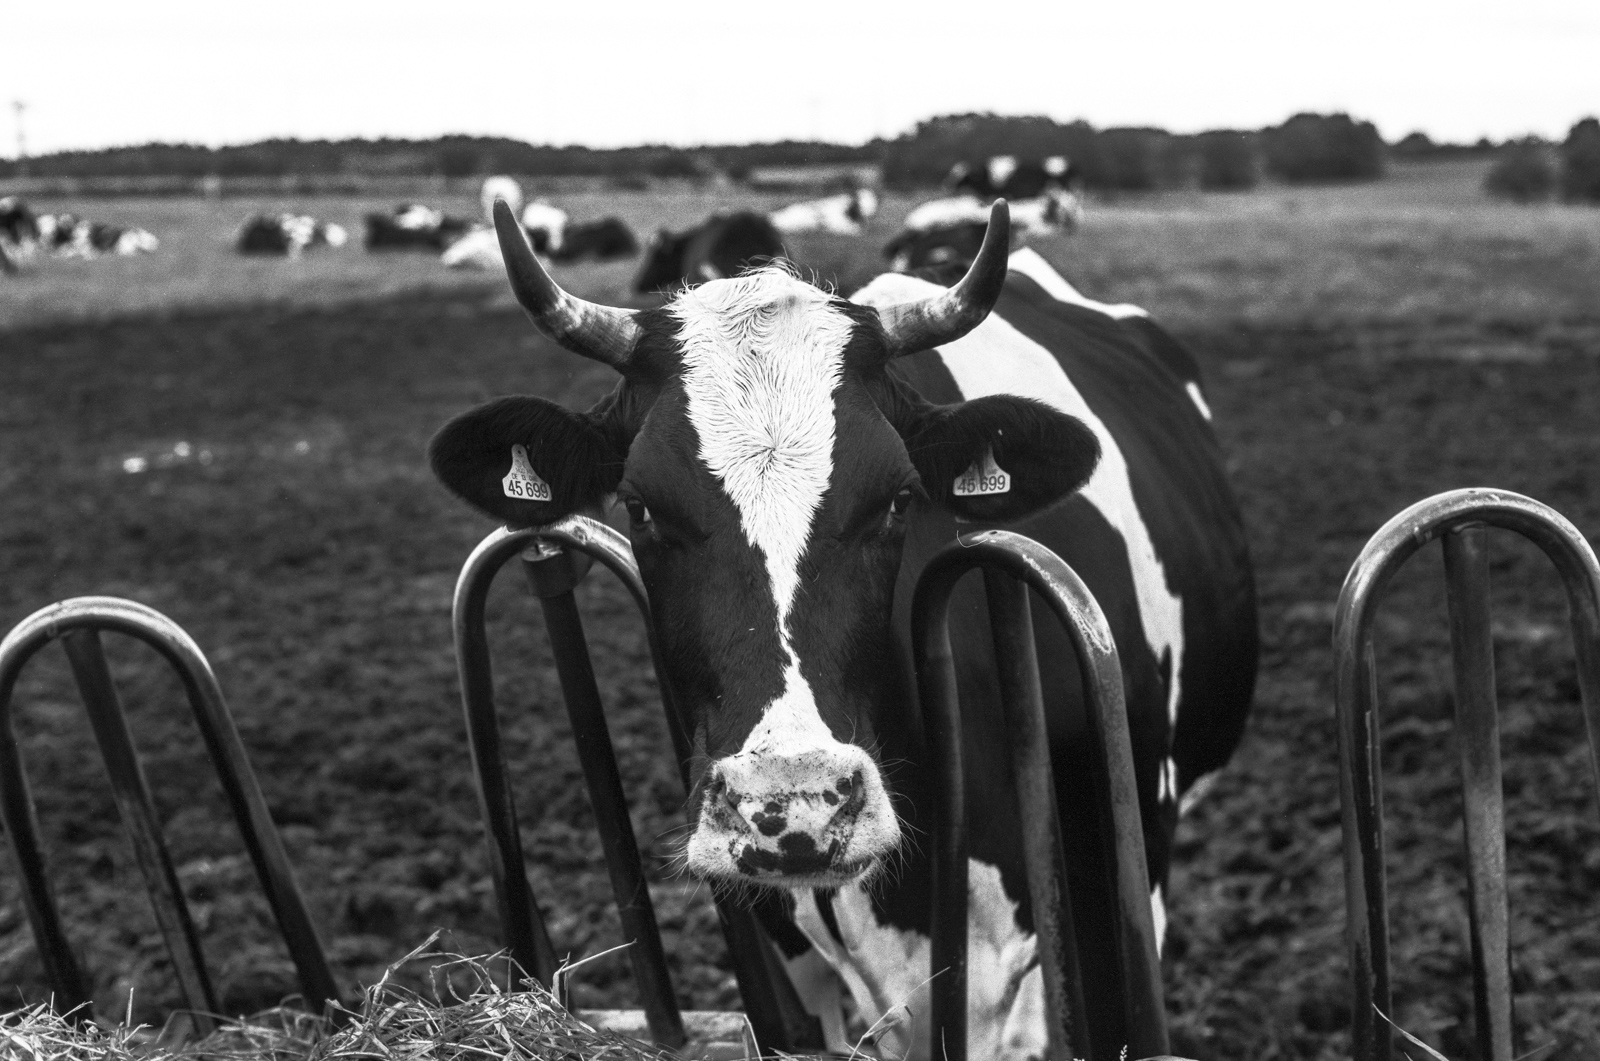 PhotoExif - Camera: Leica R7, Film: Rollei Retro 80S, Comment: